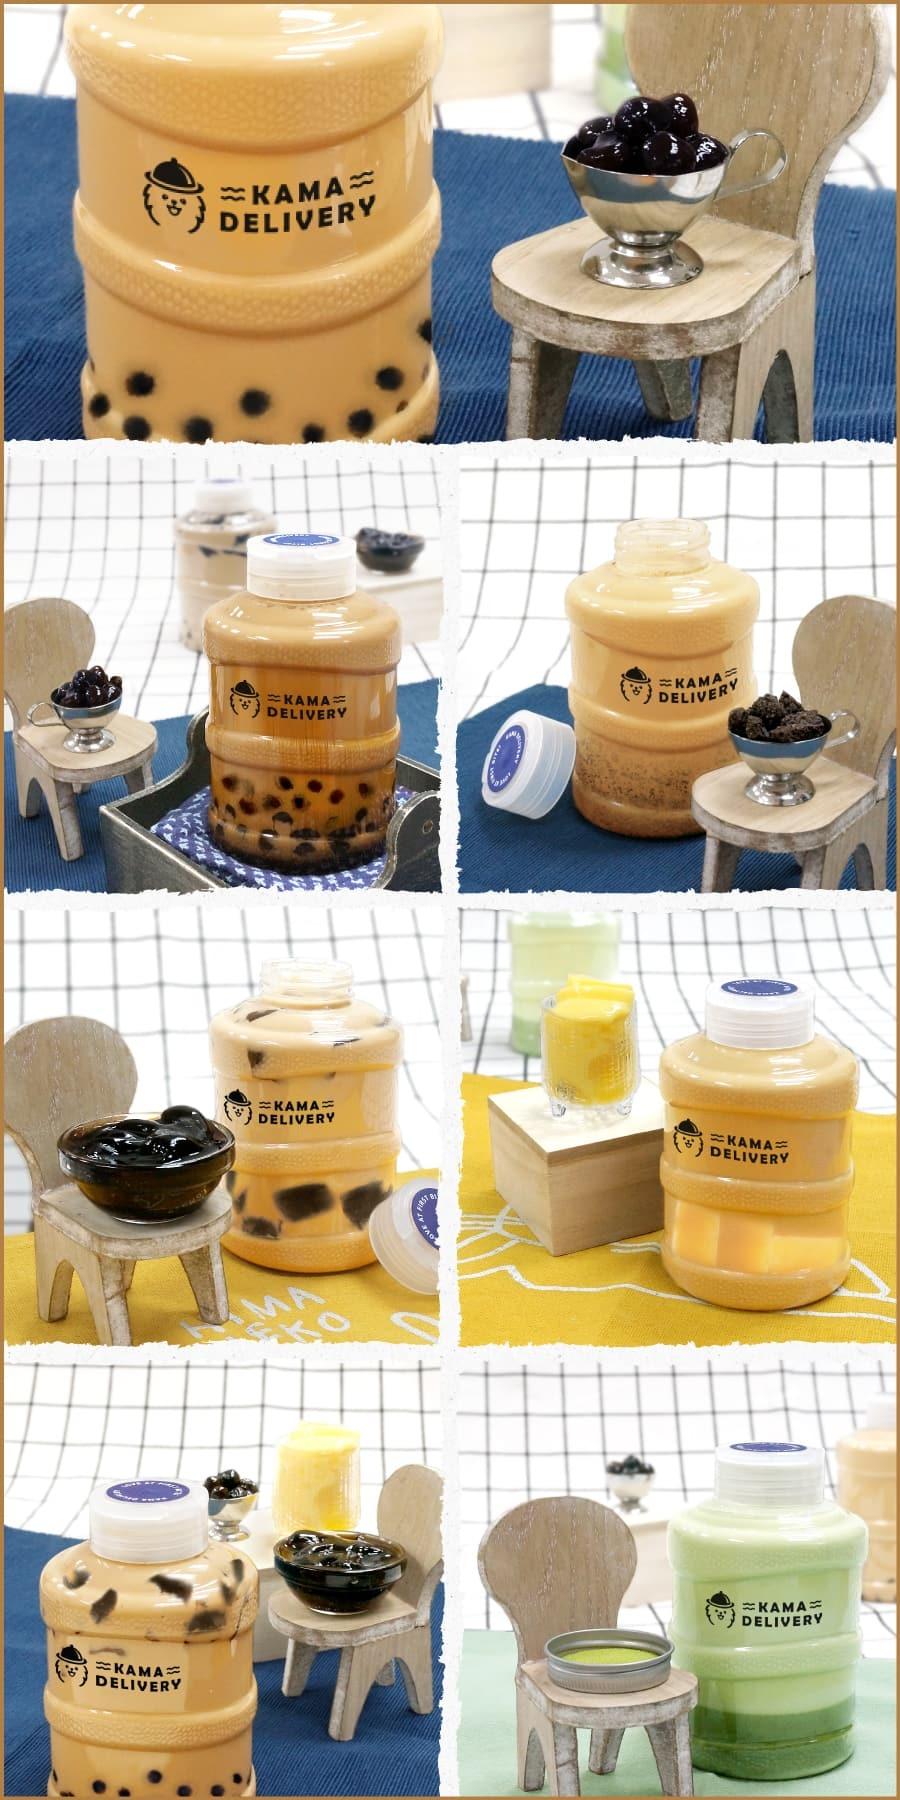 Kama Delivery推出的奶茶到會飲品系列